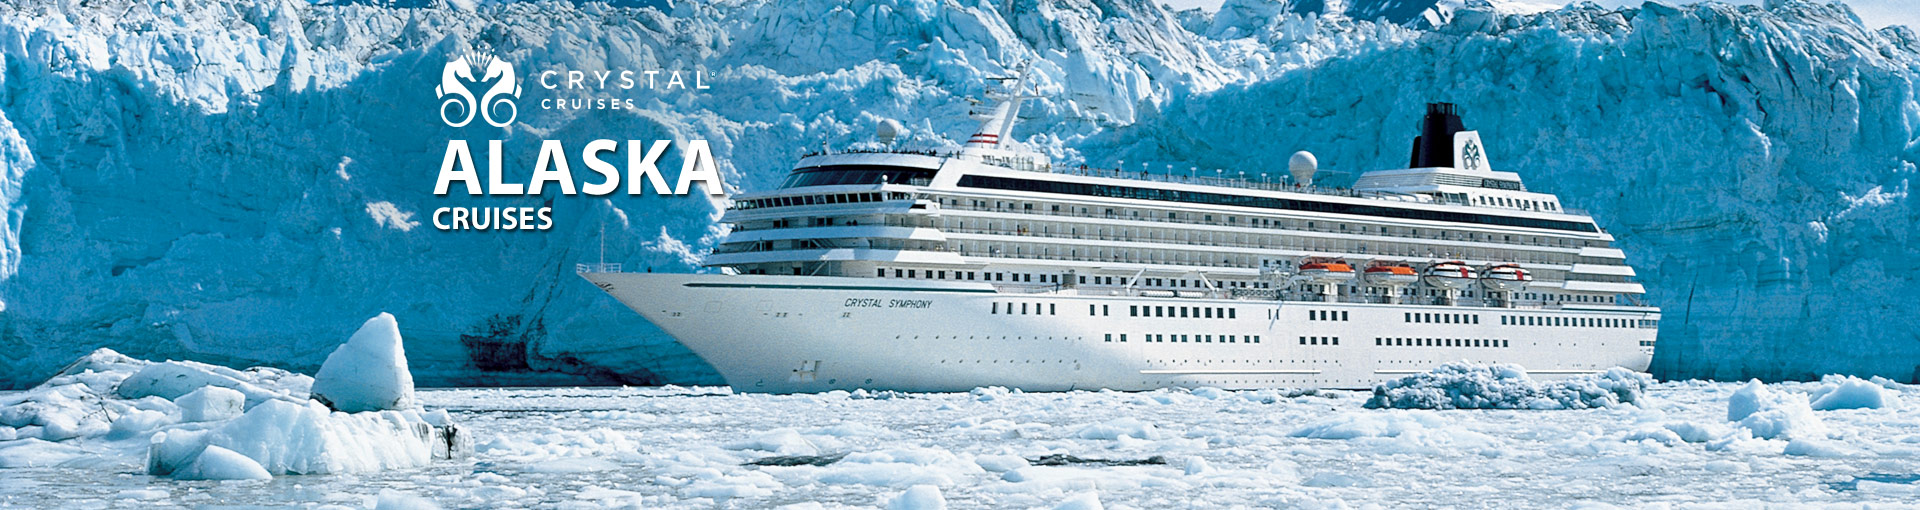 Crystal Cruises Alaska Cruises